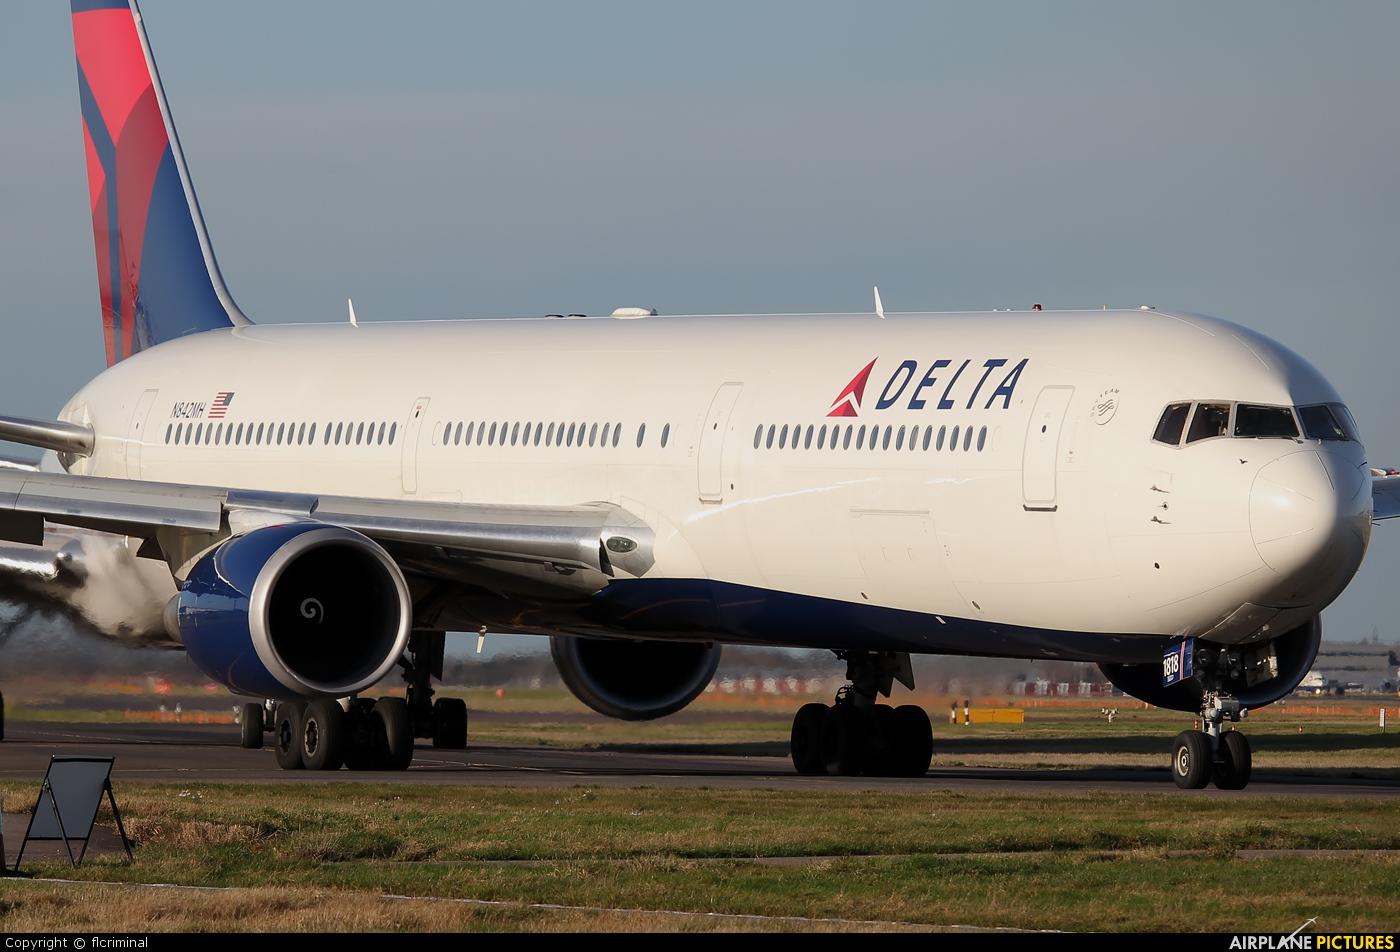 Boeing 767-400 ER. Photo. Video. Driving salon. Characteristics ...